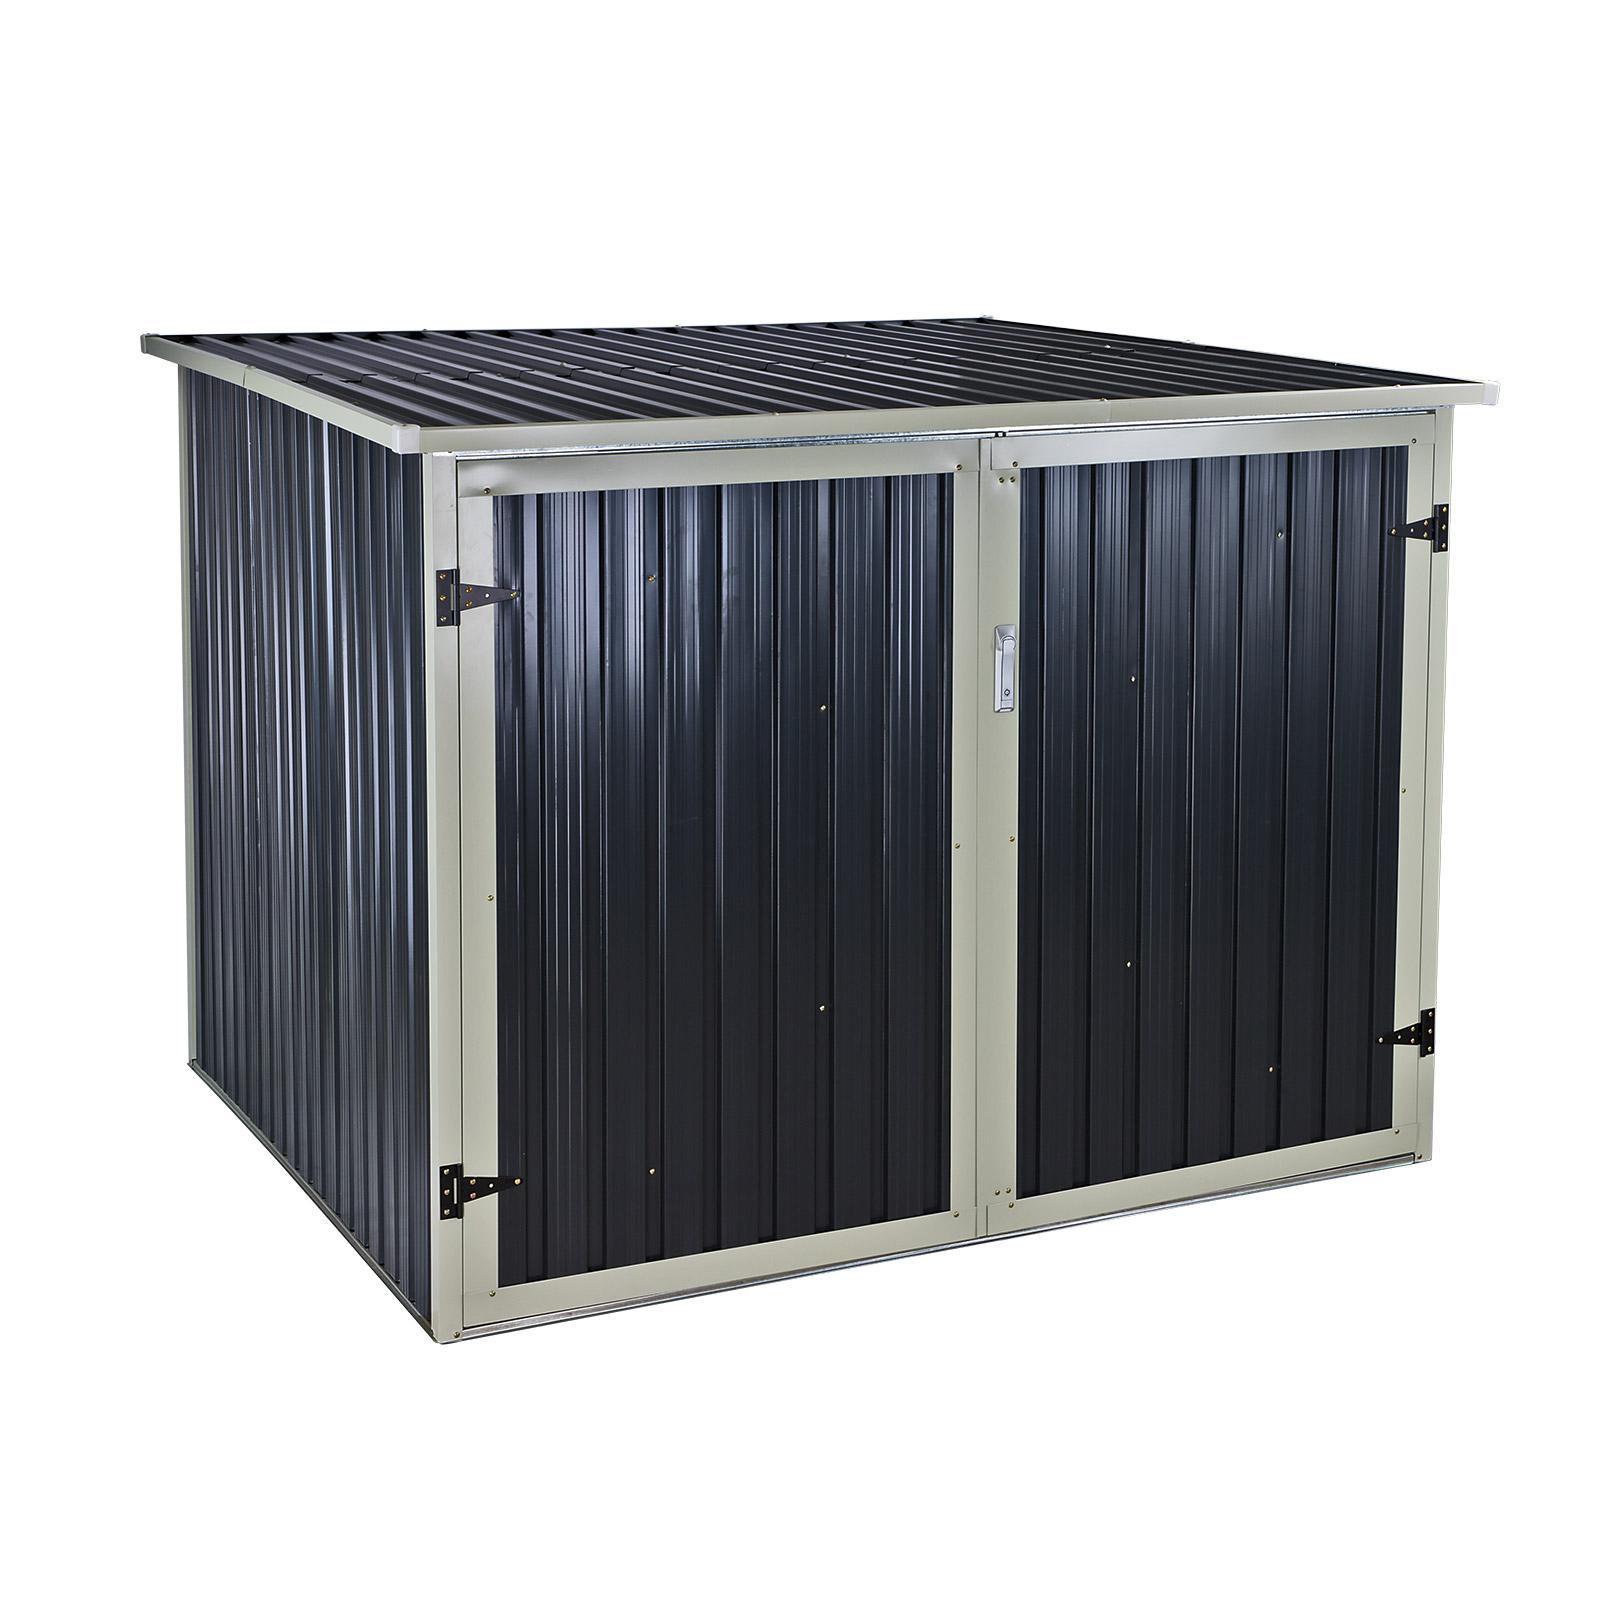 911943 fahrradbox fahrradhaus fahrradgarage fahrrad 4. Black Bedroom Furniture Sets. Home Design Ideas